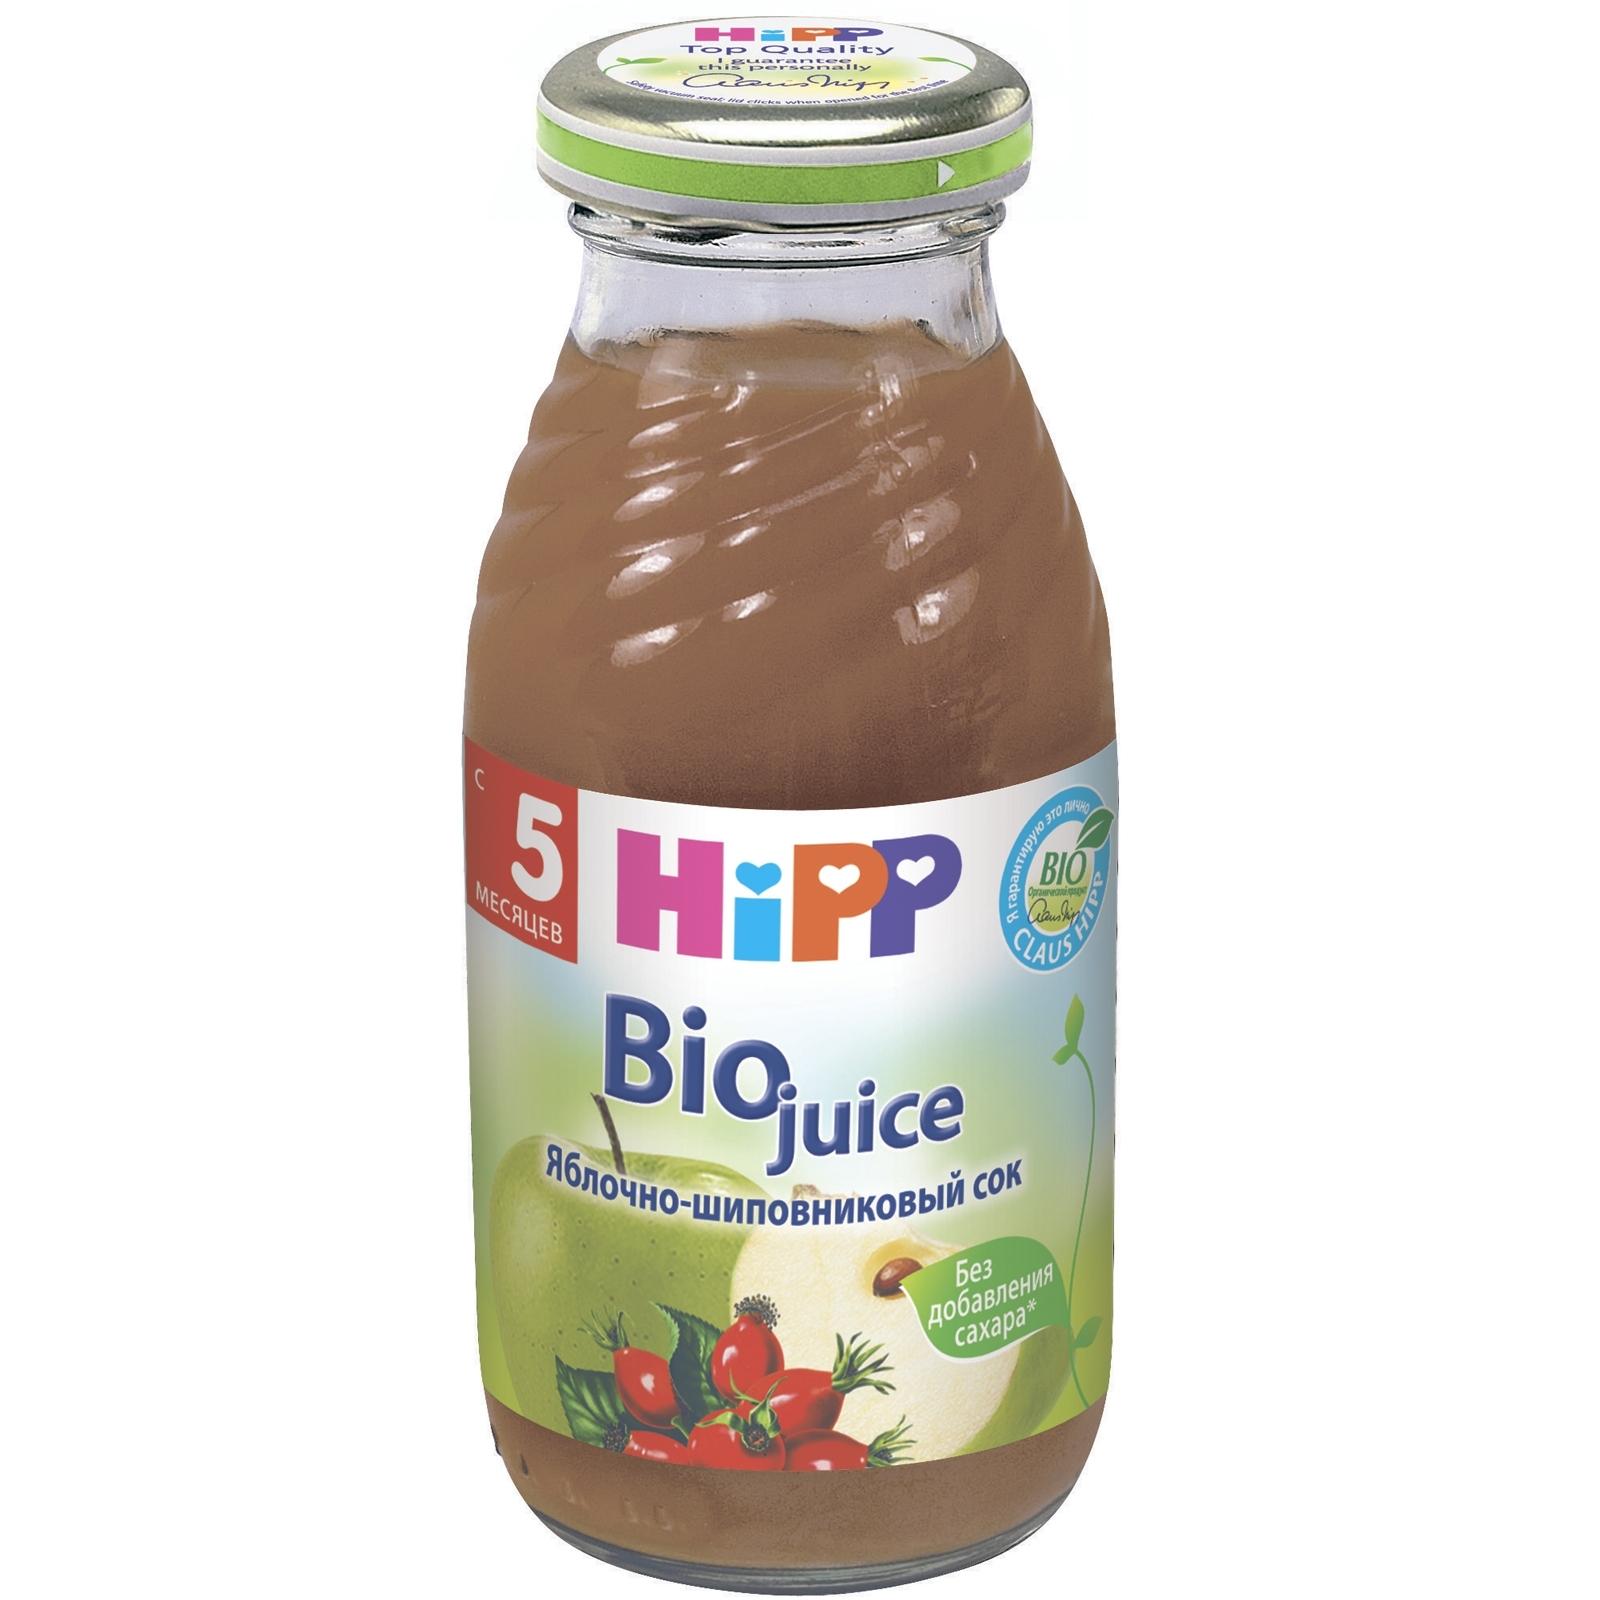 ��� Hipp 200 �� �������-������������ � ������� (� 6 ���)